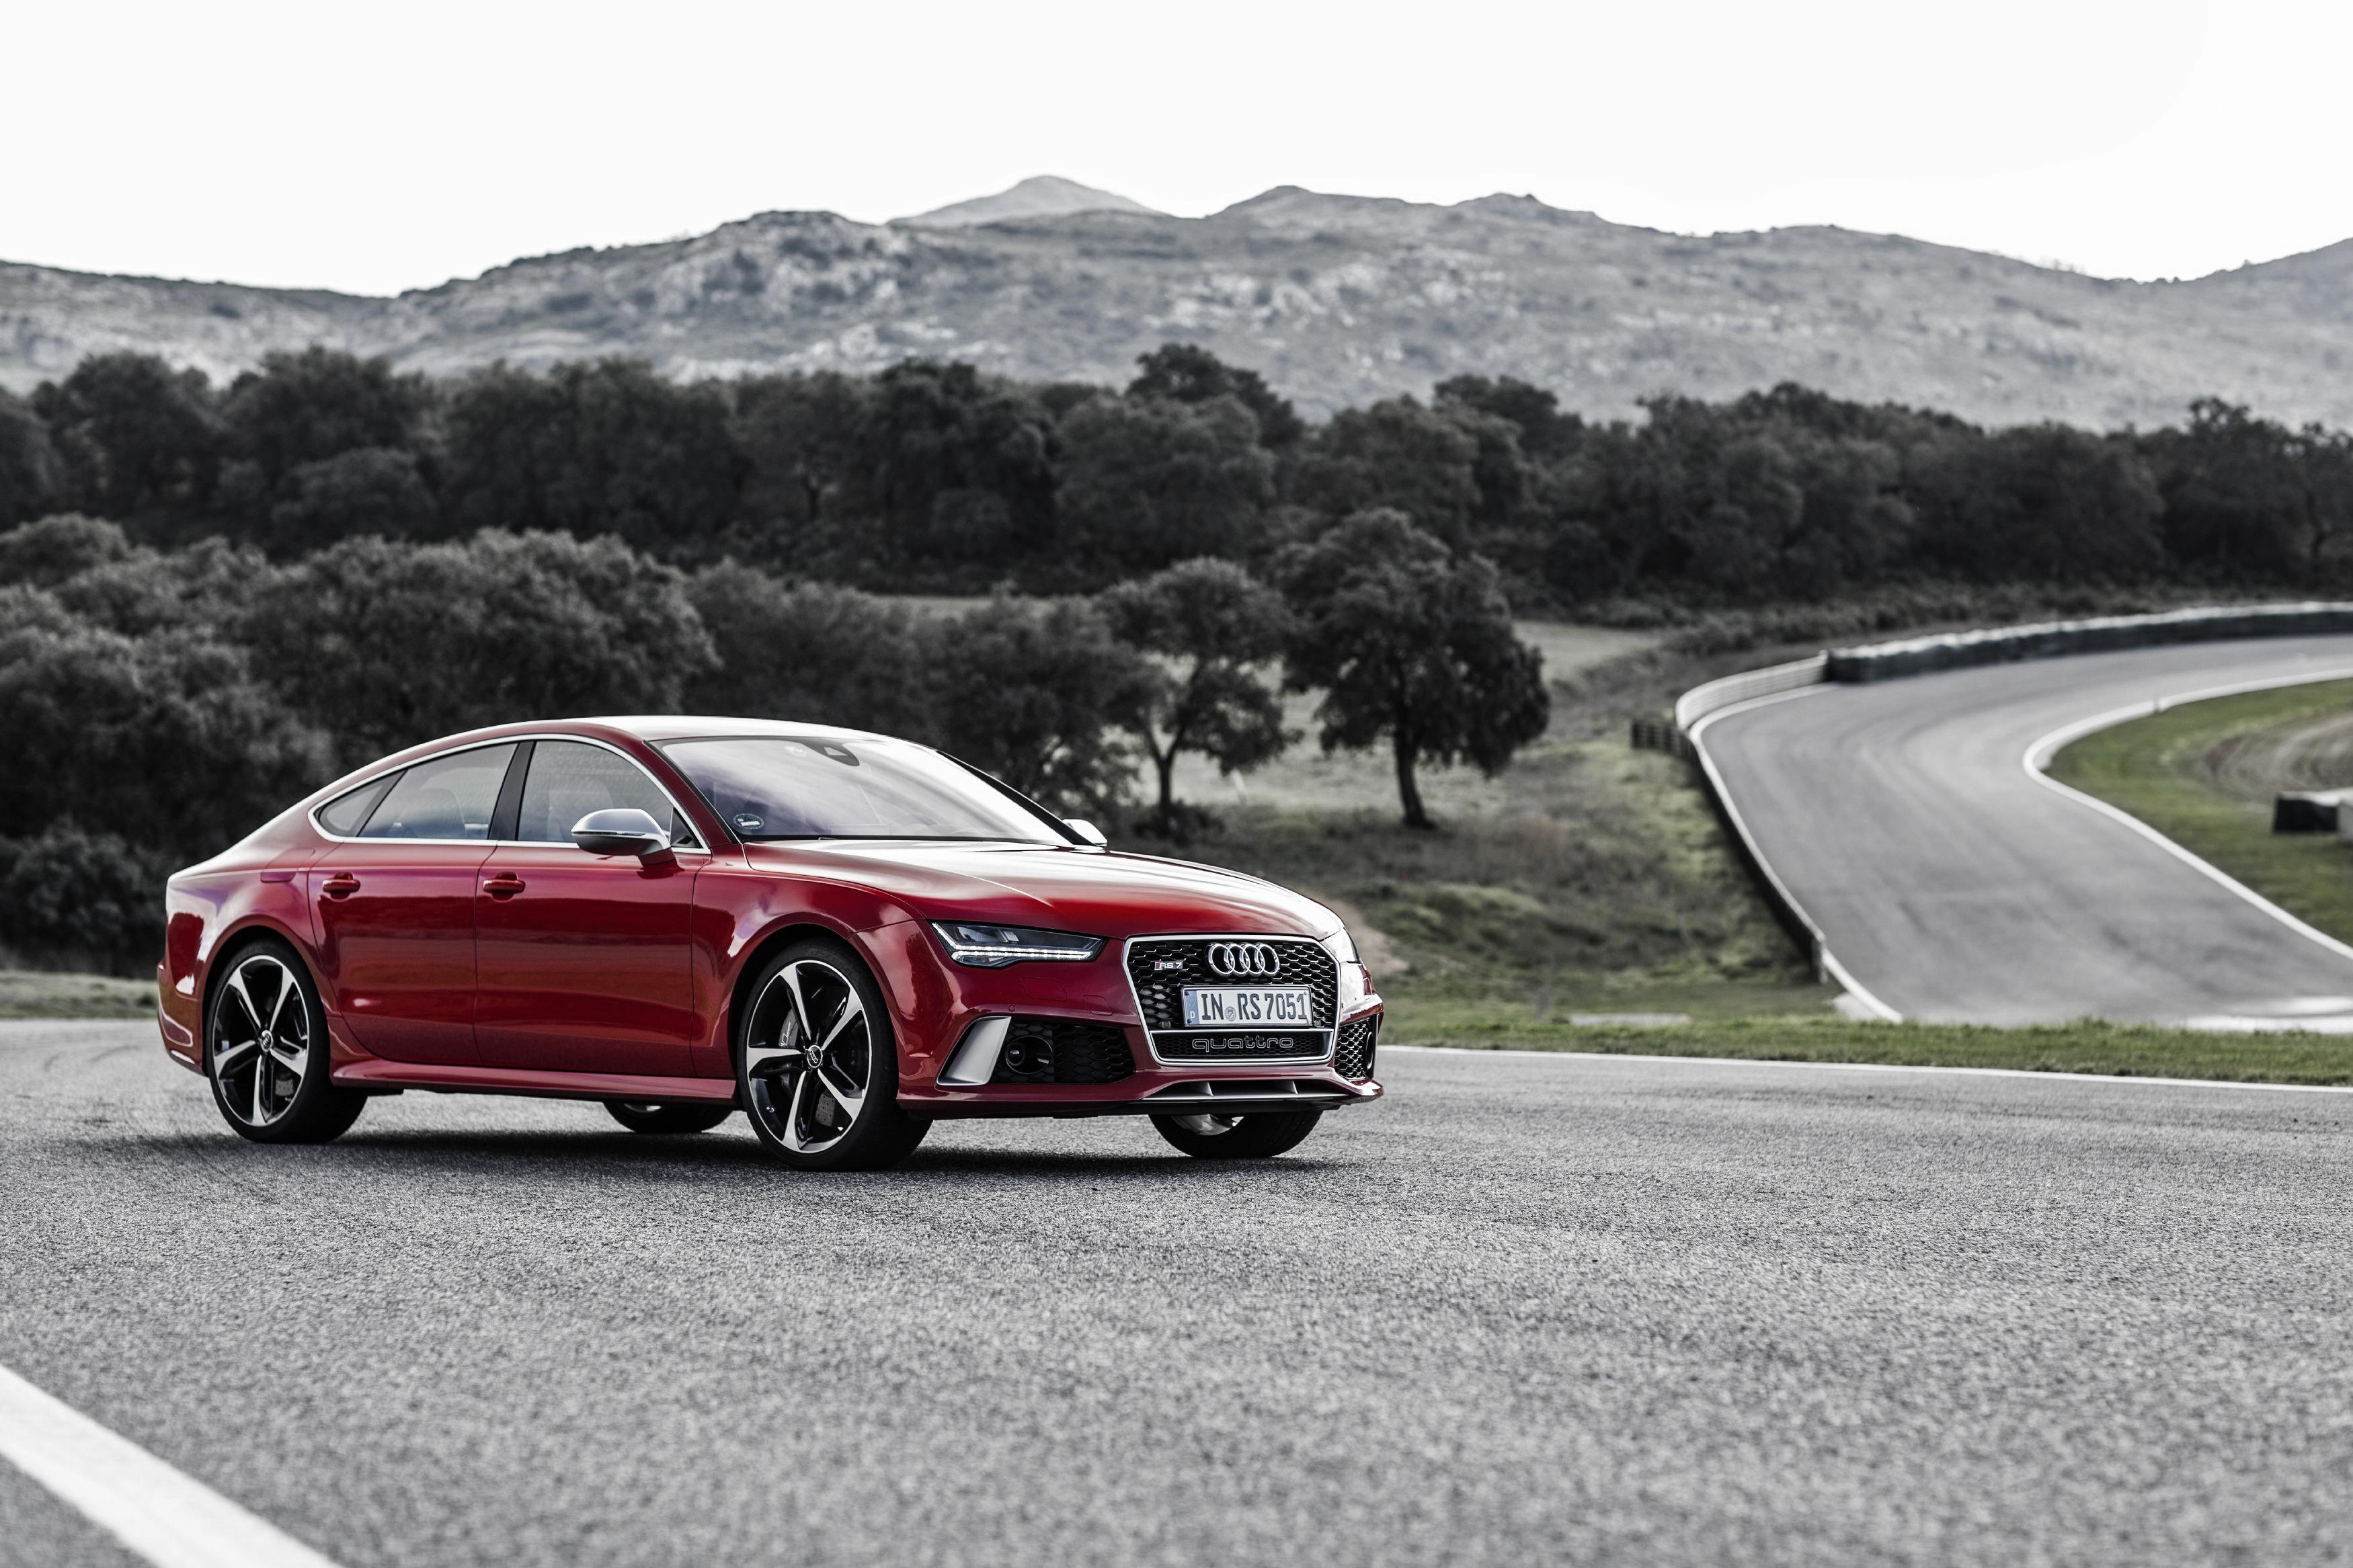 Audi RS7 Fond d'écran HD | Arrière-Plan | 3500x2333 | ID:920910 - Wallpaper Abyss